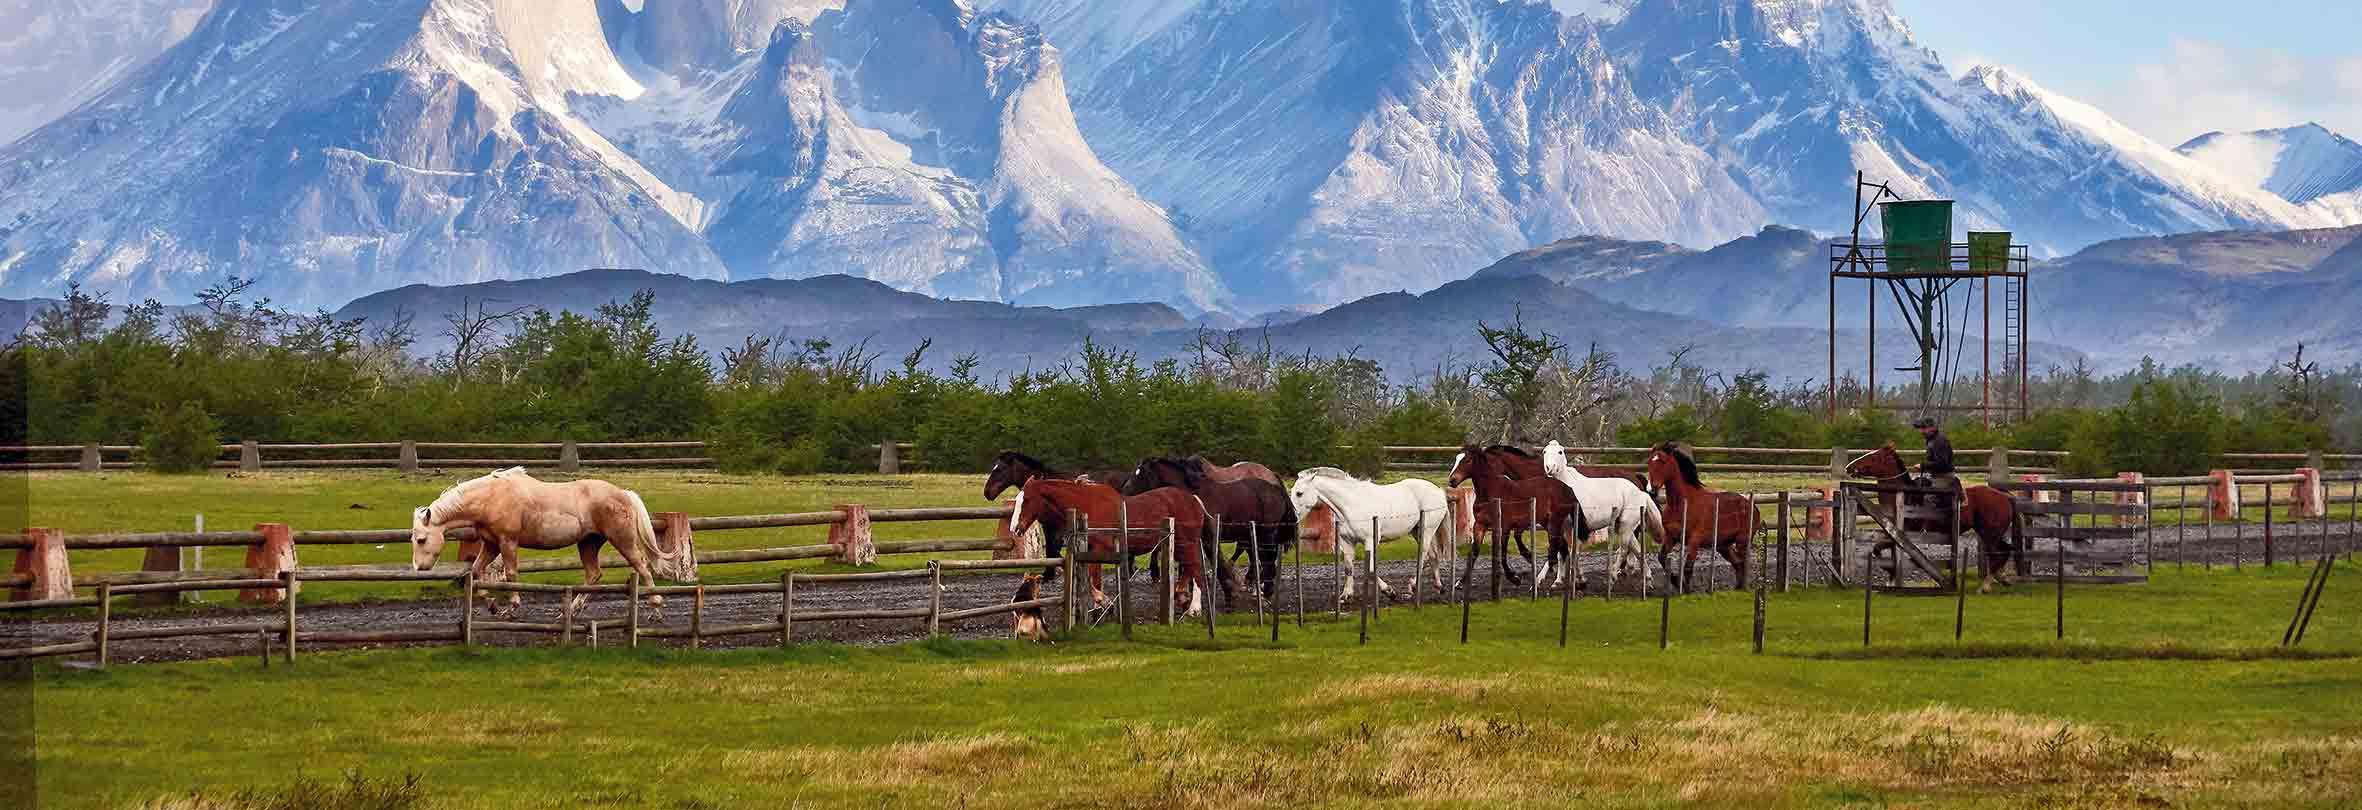 Patagonien, Torres del Paine-Nationalpark